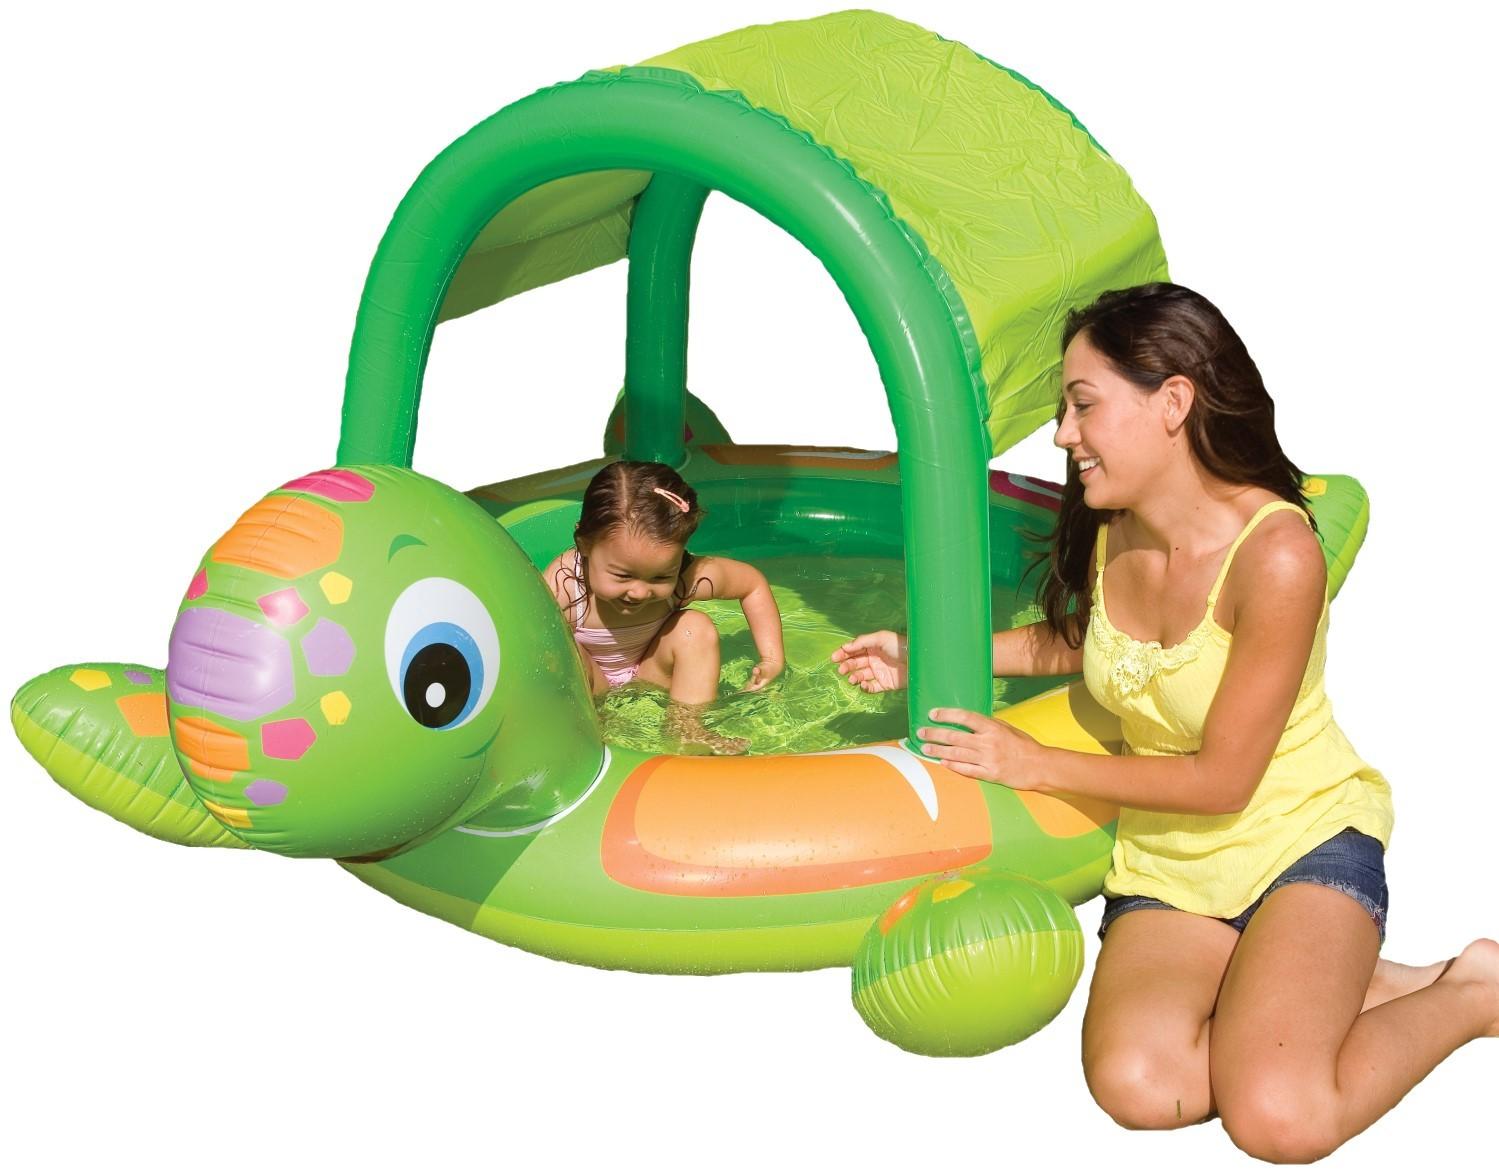 baby pool turtle. Black Bedroom Furniture Sets. Home Design Ideas